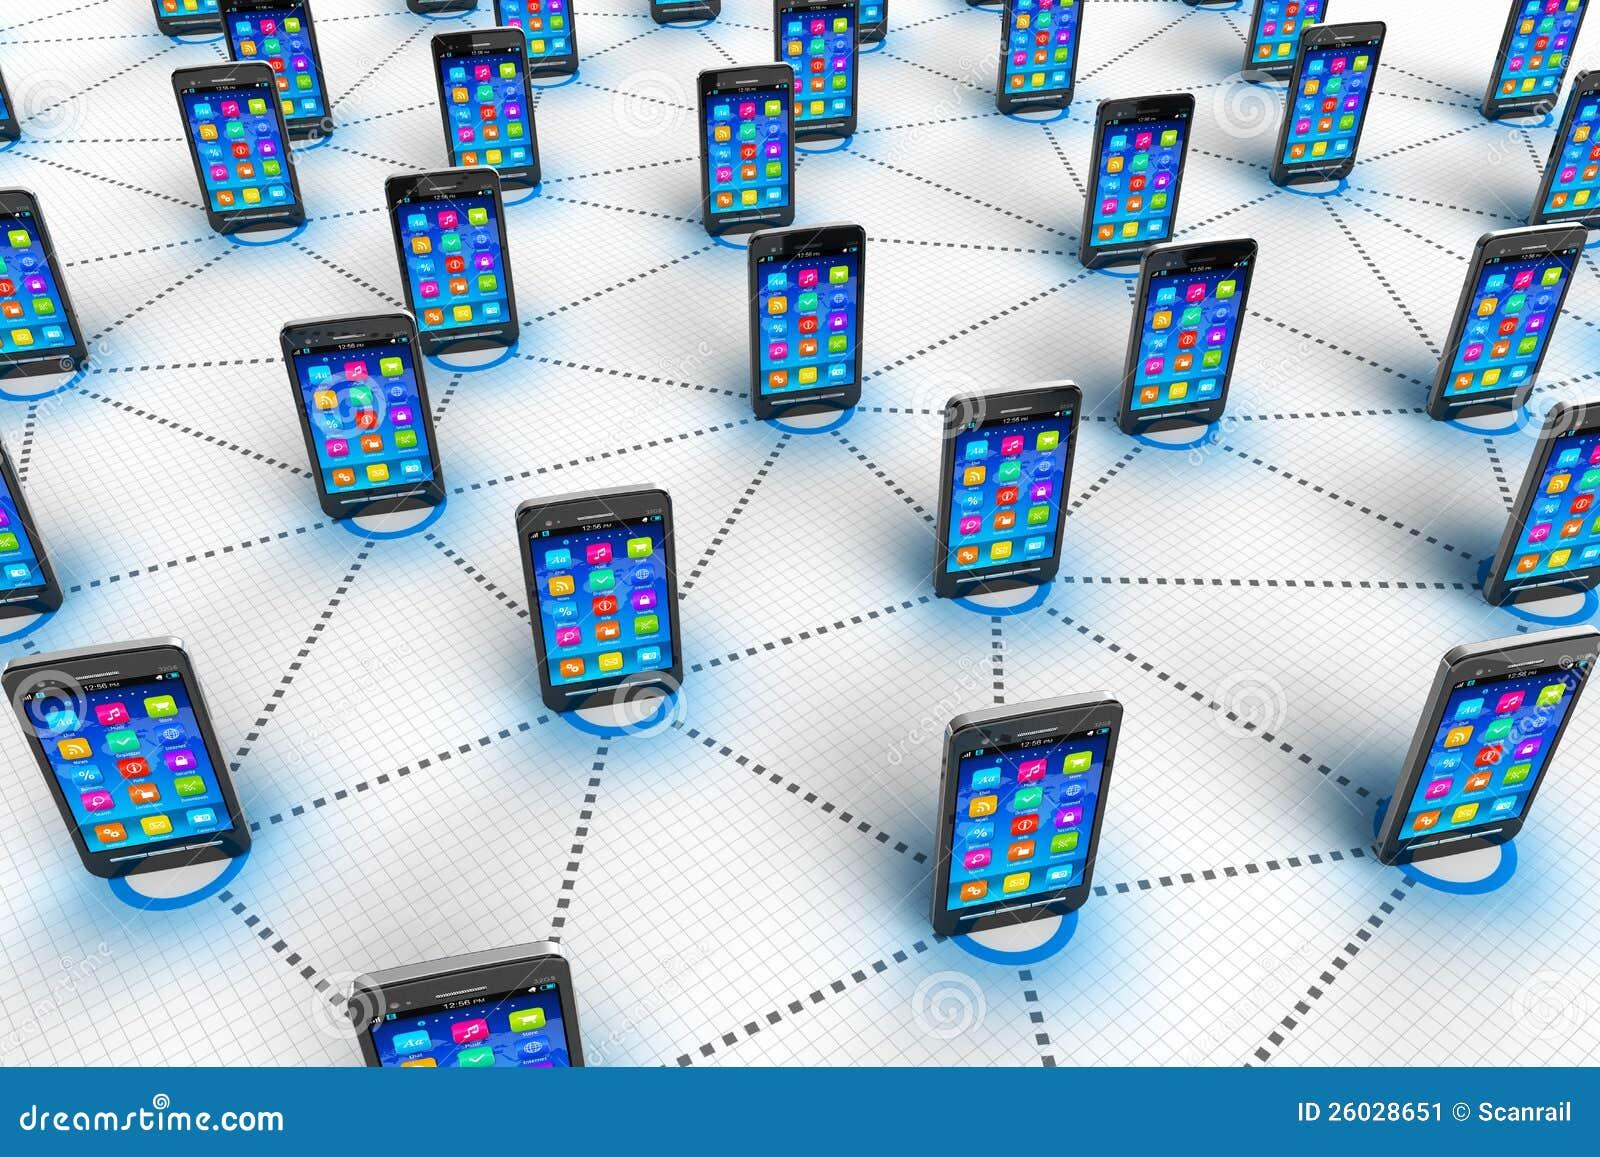 Essay on communication revolution